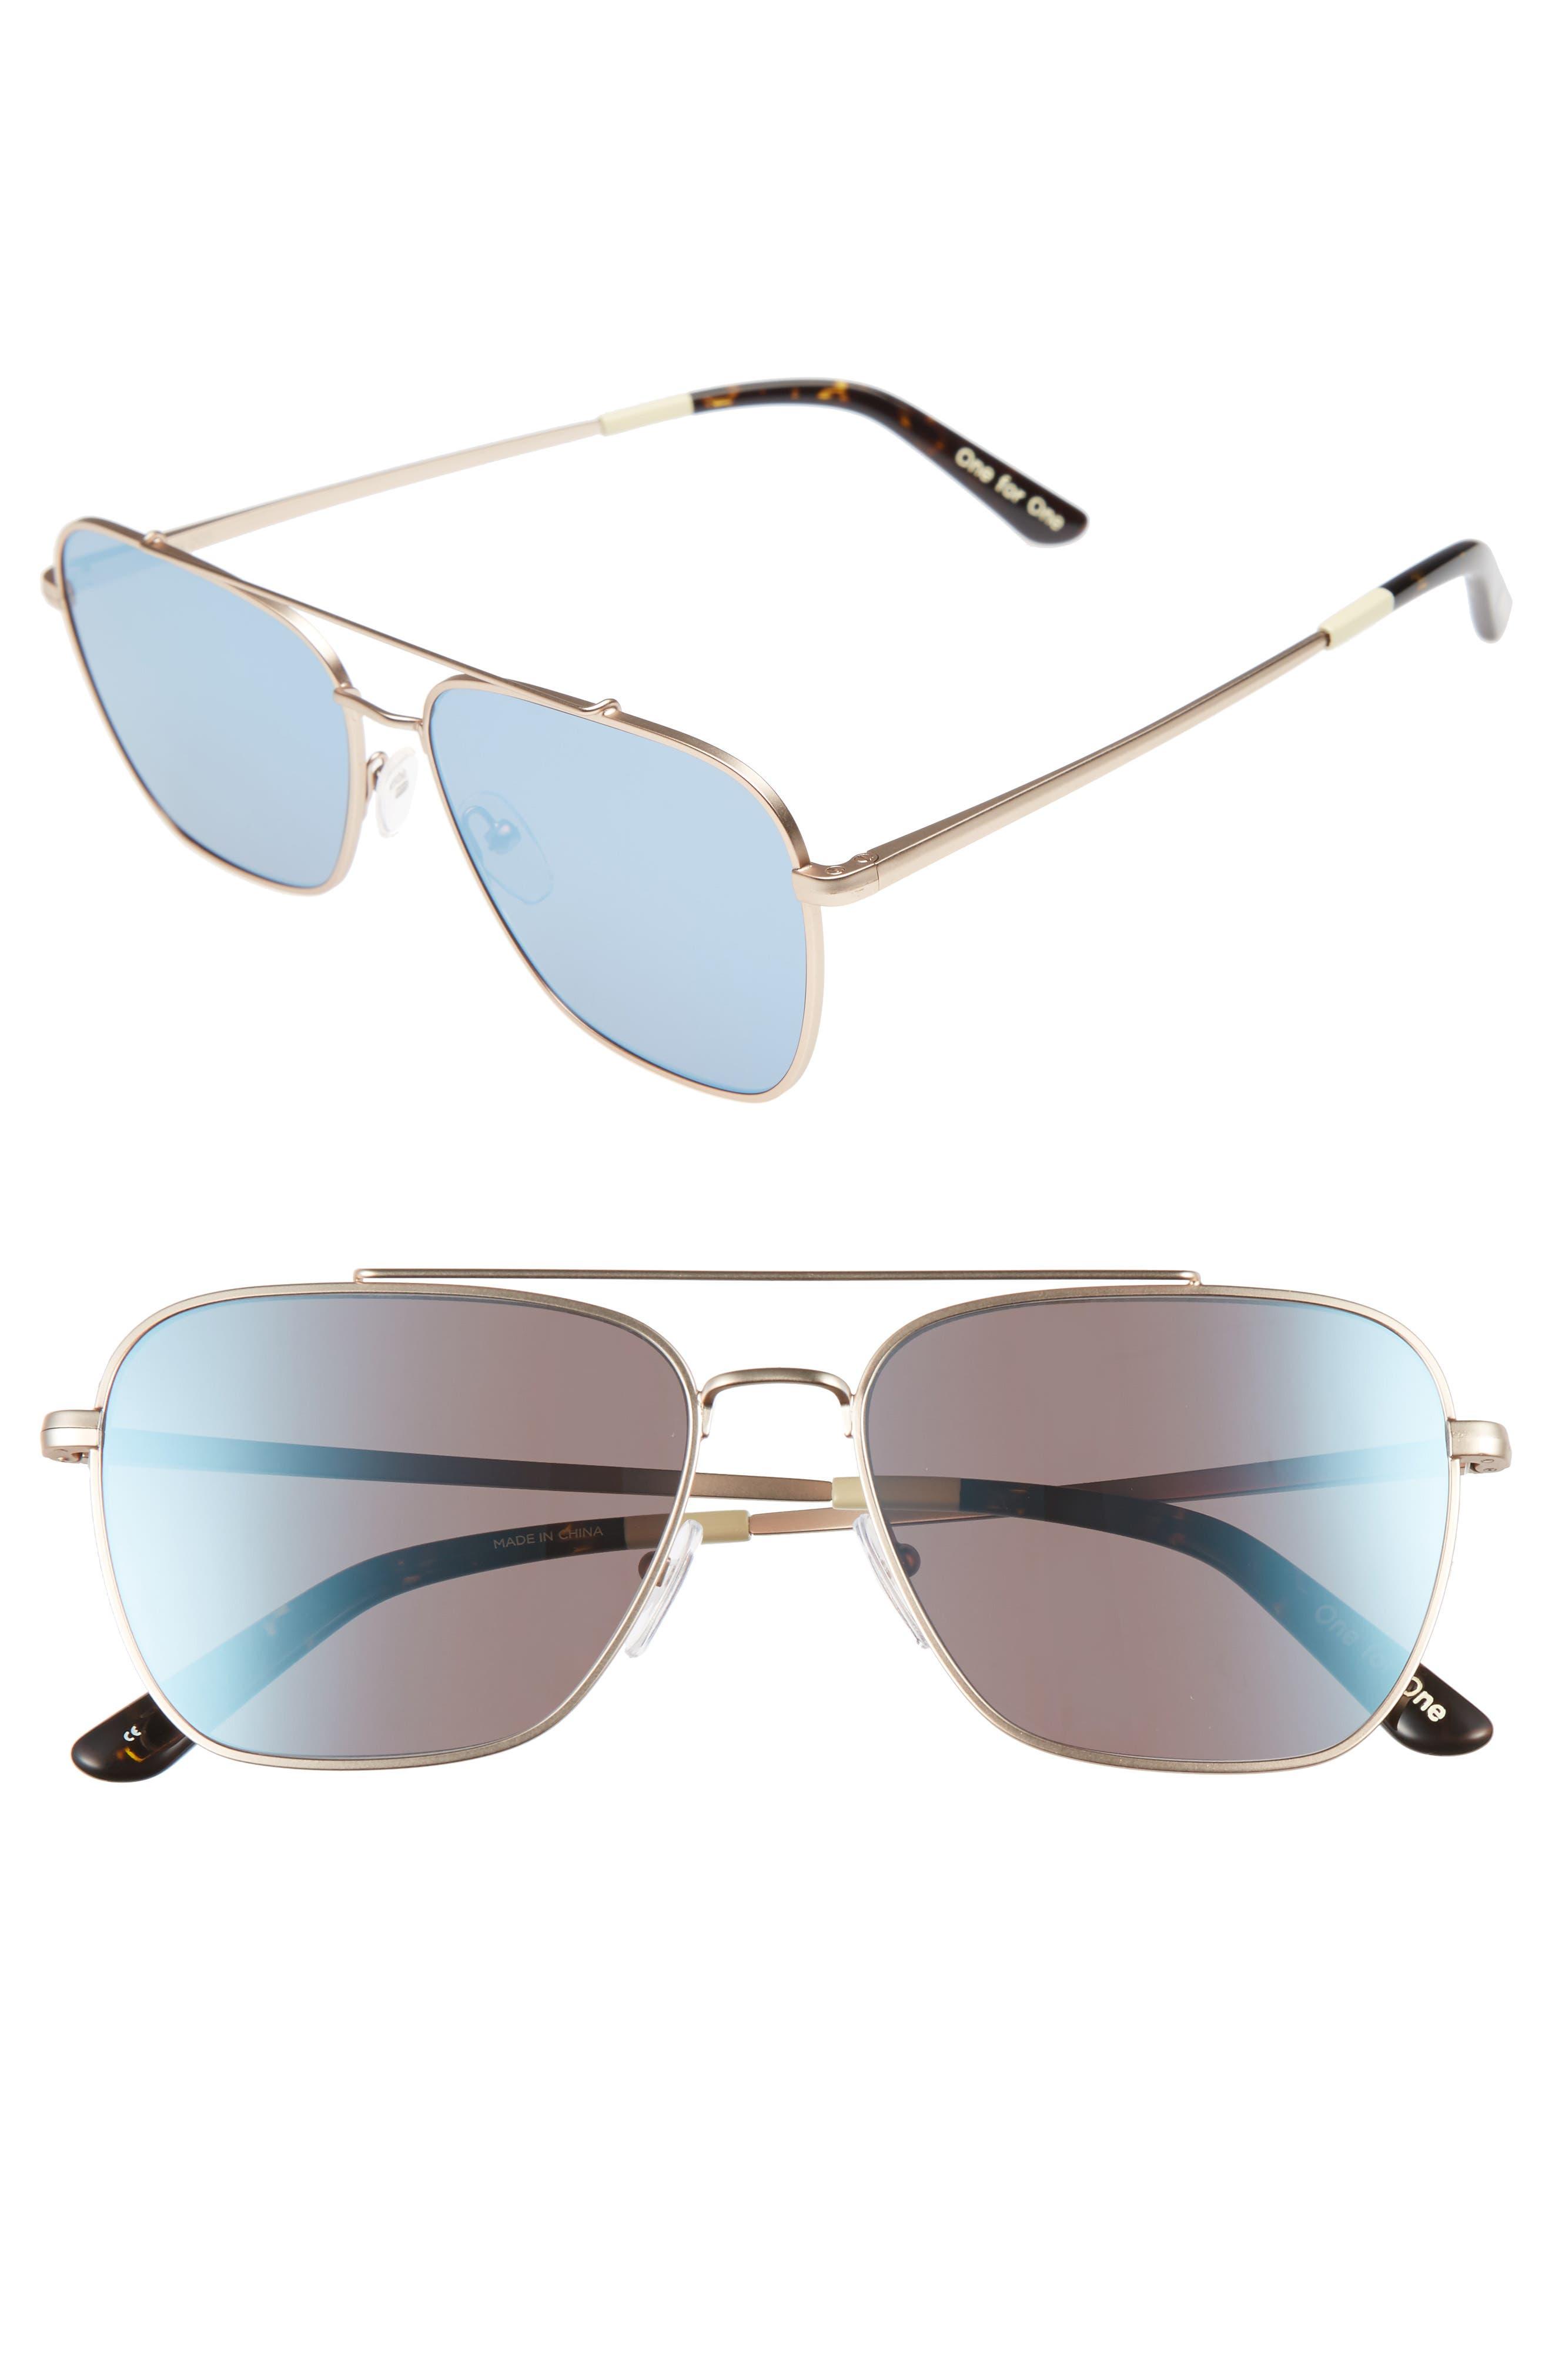 Irwin 58mm Aviator Sunglasses,                         Main,                         color, Satin Gold